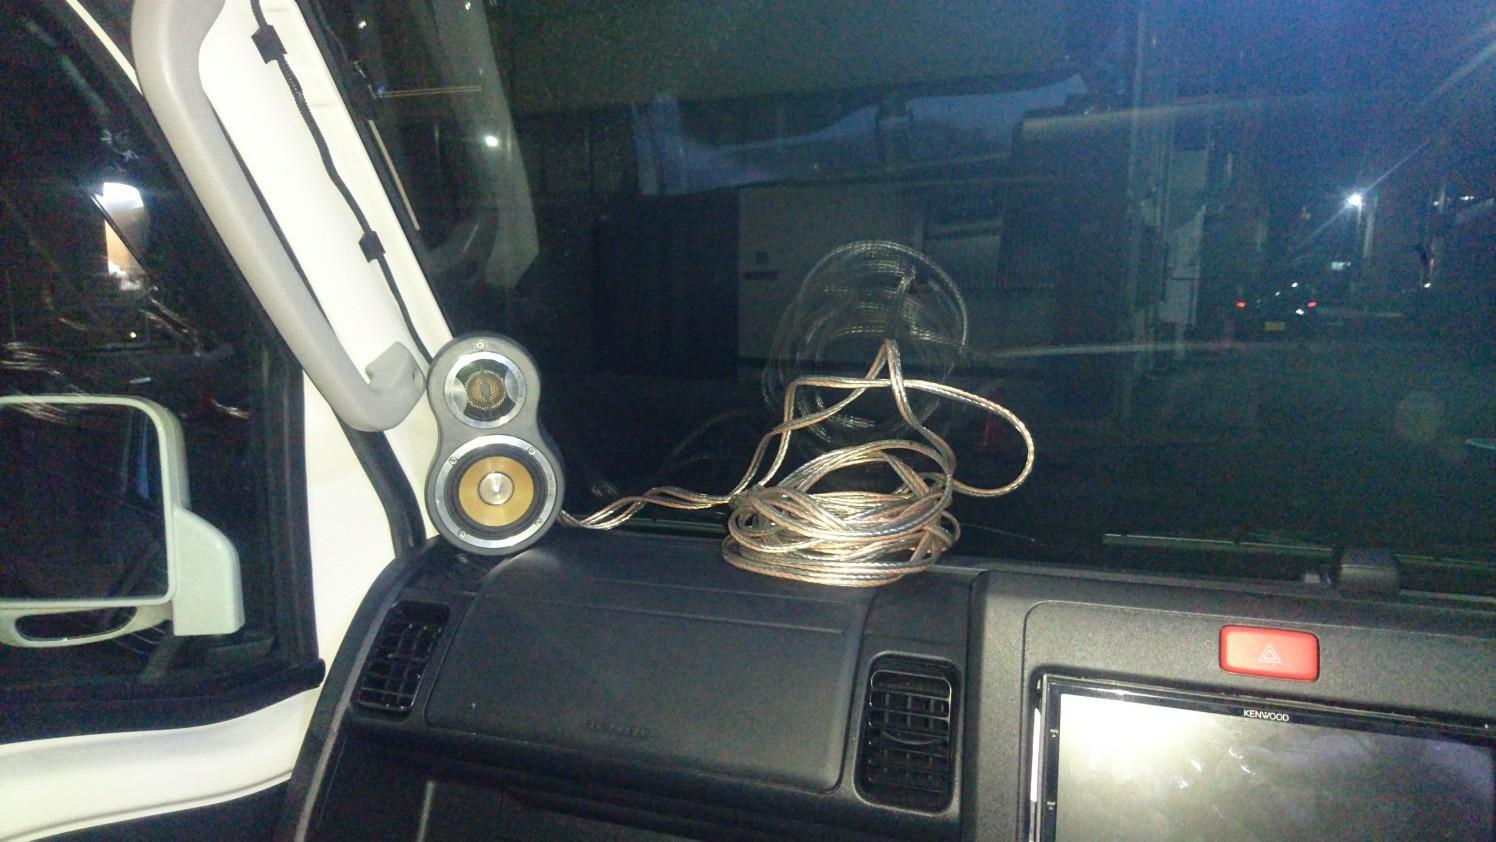 S510Pハイゼットトラックジャンボ用サブウーファーボックス製作⑤